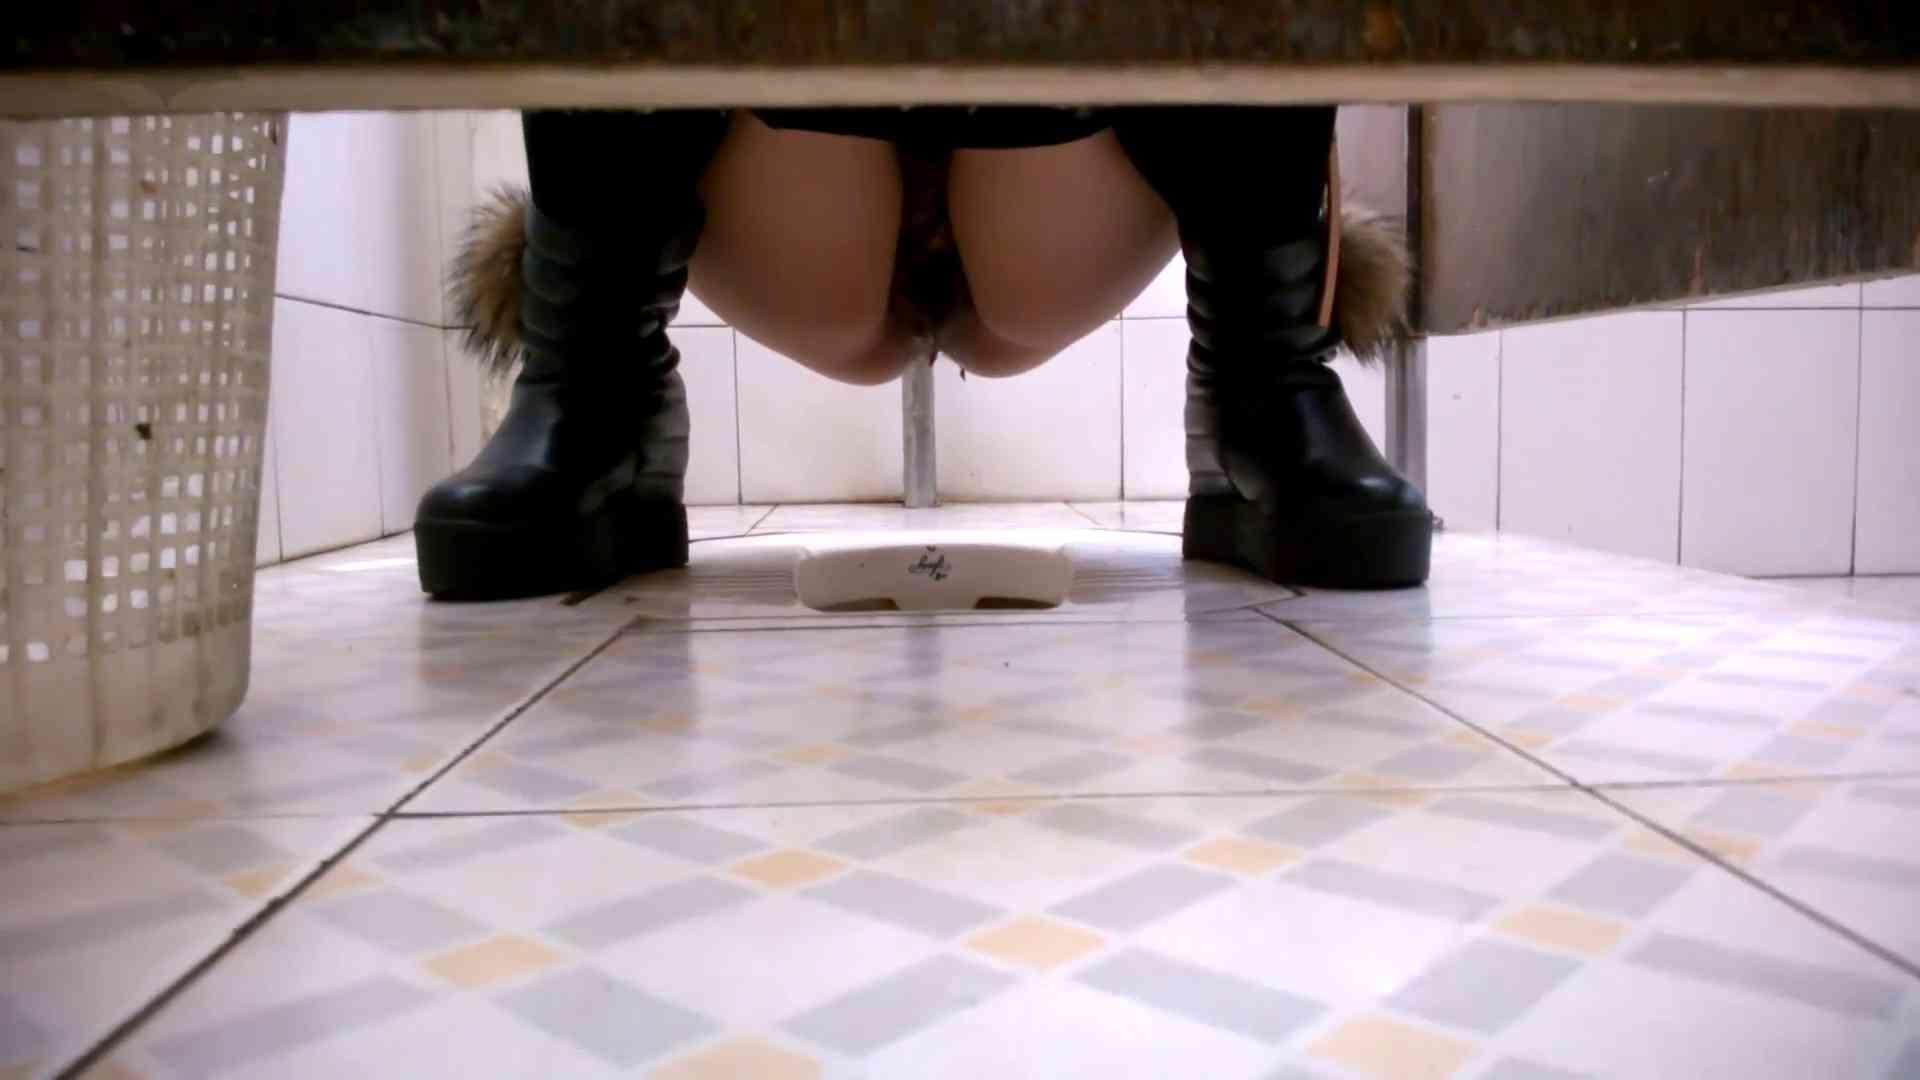 JD盗撮 美女の洗面所の秘密 Vol.34 OLのボディ 隠し撮りオマンコ動画紹介 73PIX 33